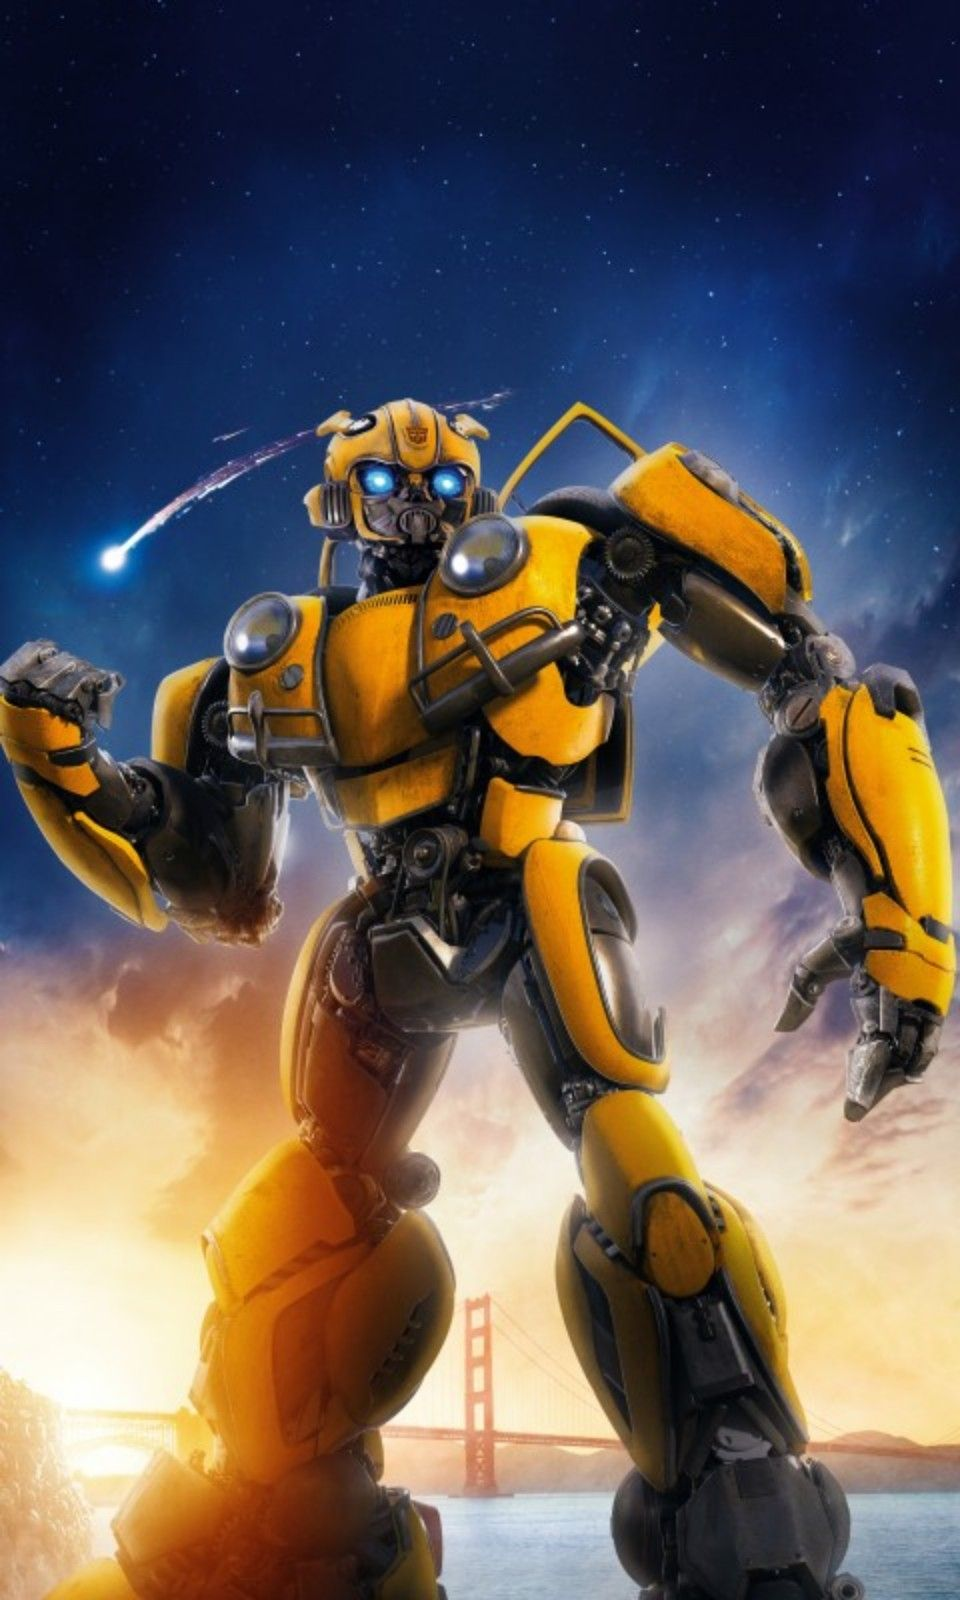 Pin by Inke on Transformers Superhero, Iron man, Character